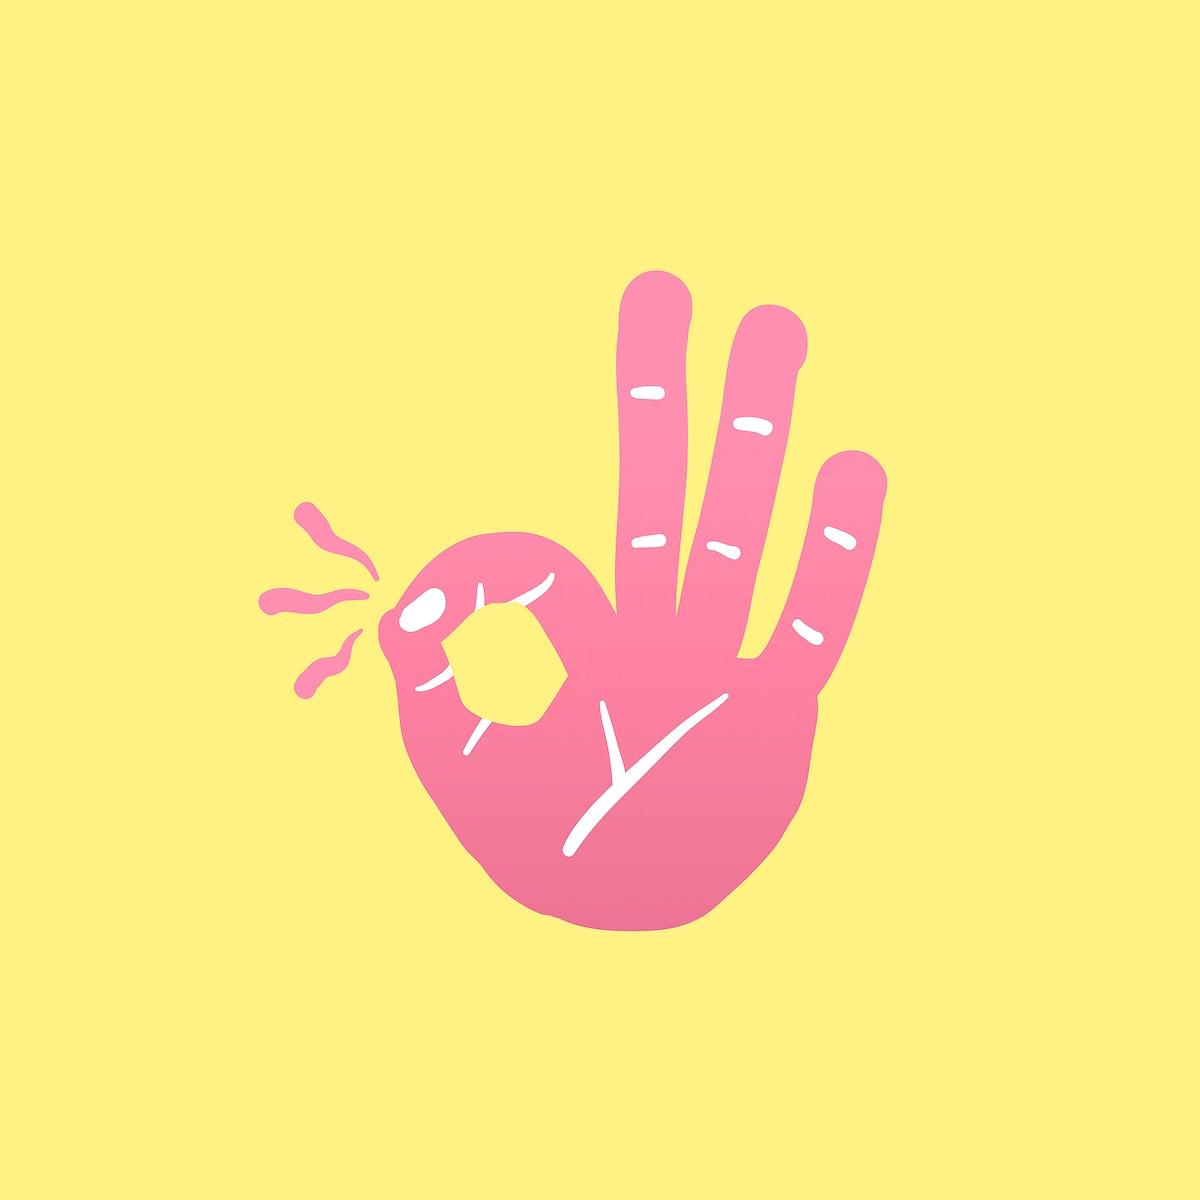 Ok hand gesture icon illustration